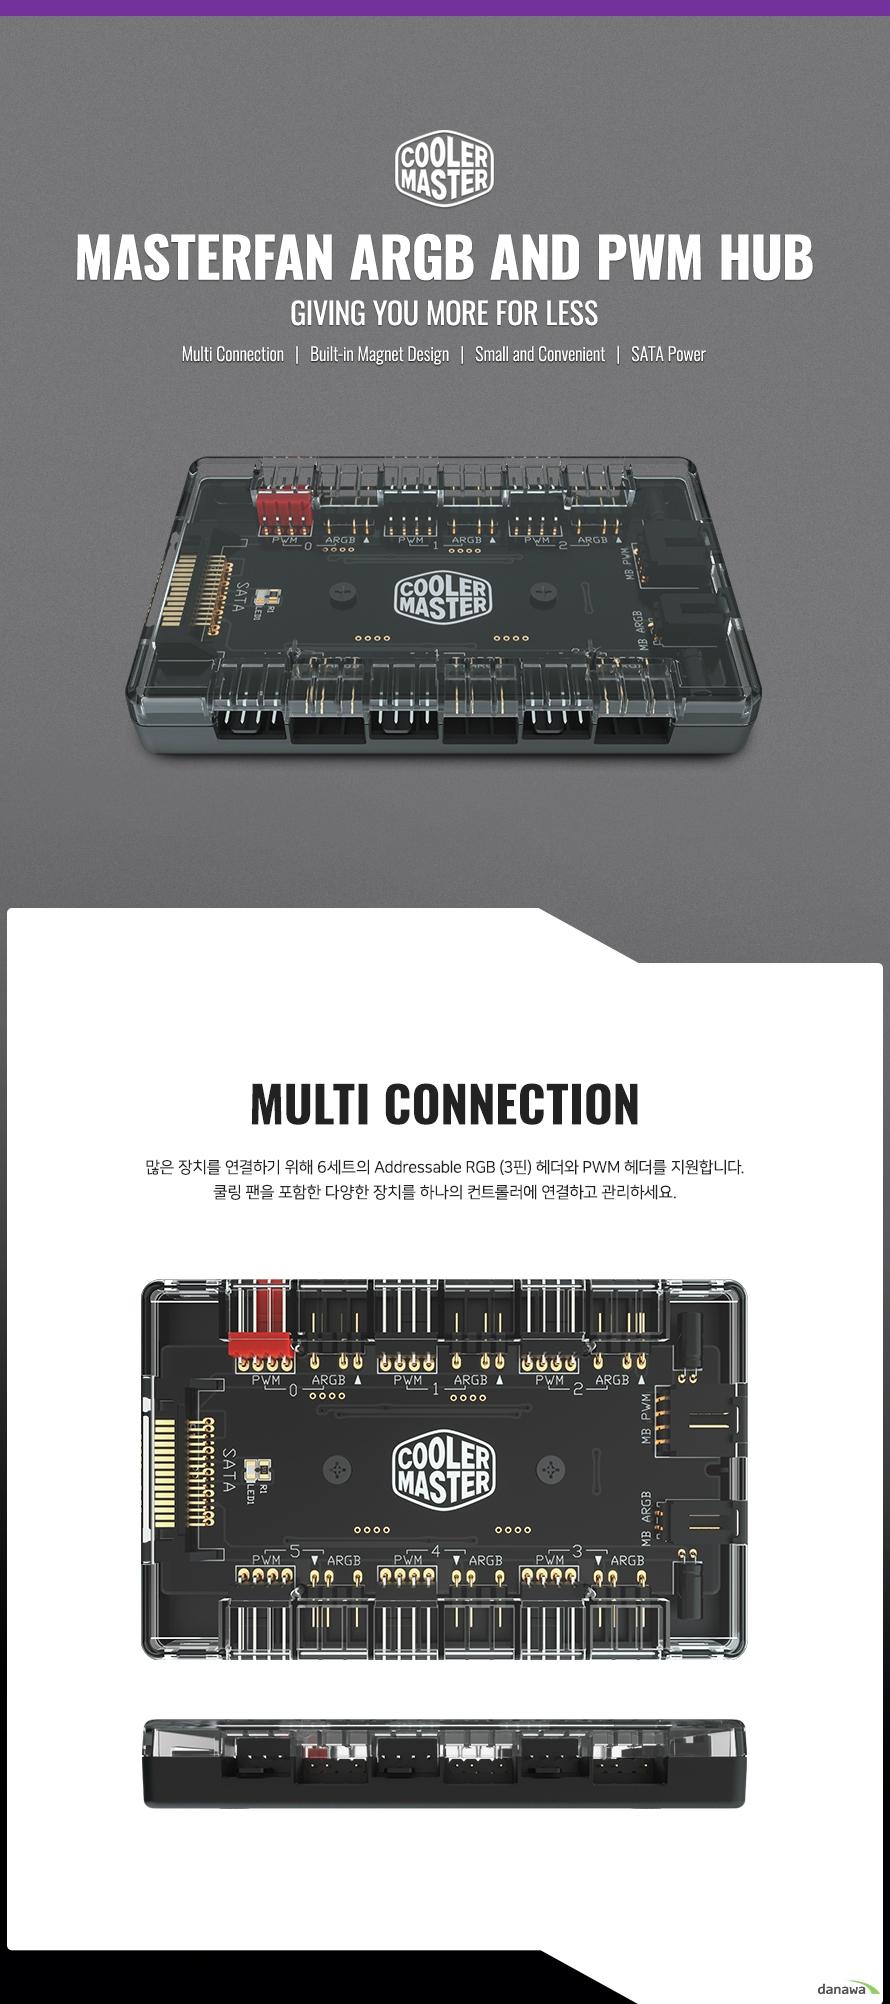 MASTERFAN ARGB AND PWM HUB  많은 장치를 연결하기 위해 6세트의 Addressable RGB (3핀) 헤더와 PWM 헤더를 지원합니다.  쿨링 팬을 포함한 다양한 장치를 하나의 컨트롤러에 연결하고 관리하세요.    컨트롤러 후면에 2개의 자석이 내장되어 금속 재질로 이루어진 케이스에 부착할 수 있습니다. 양면 테이프를 사용하지 않기 때문에 더욱 편리합니다.   최대 부하 상태에서도 안정적인 출력을  유지할 수 있습니다.   공간을 효과적으로 절약할 수 있고 케이블을 정리할 수 있도록 도와줍니다.